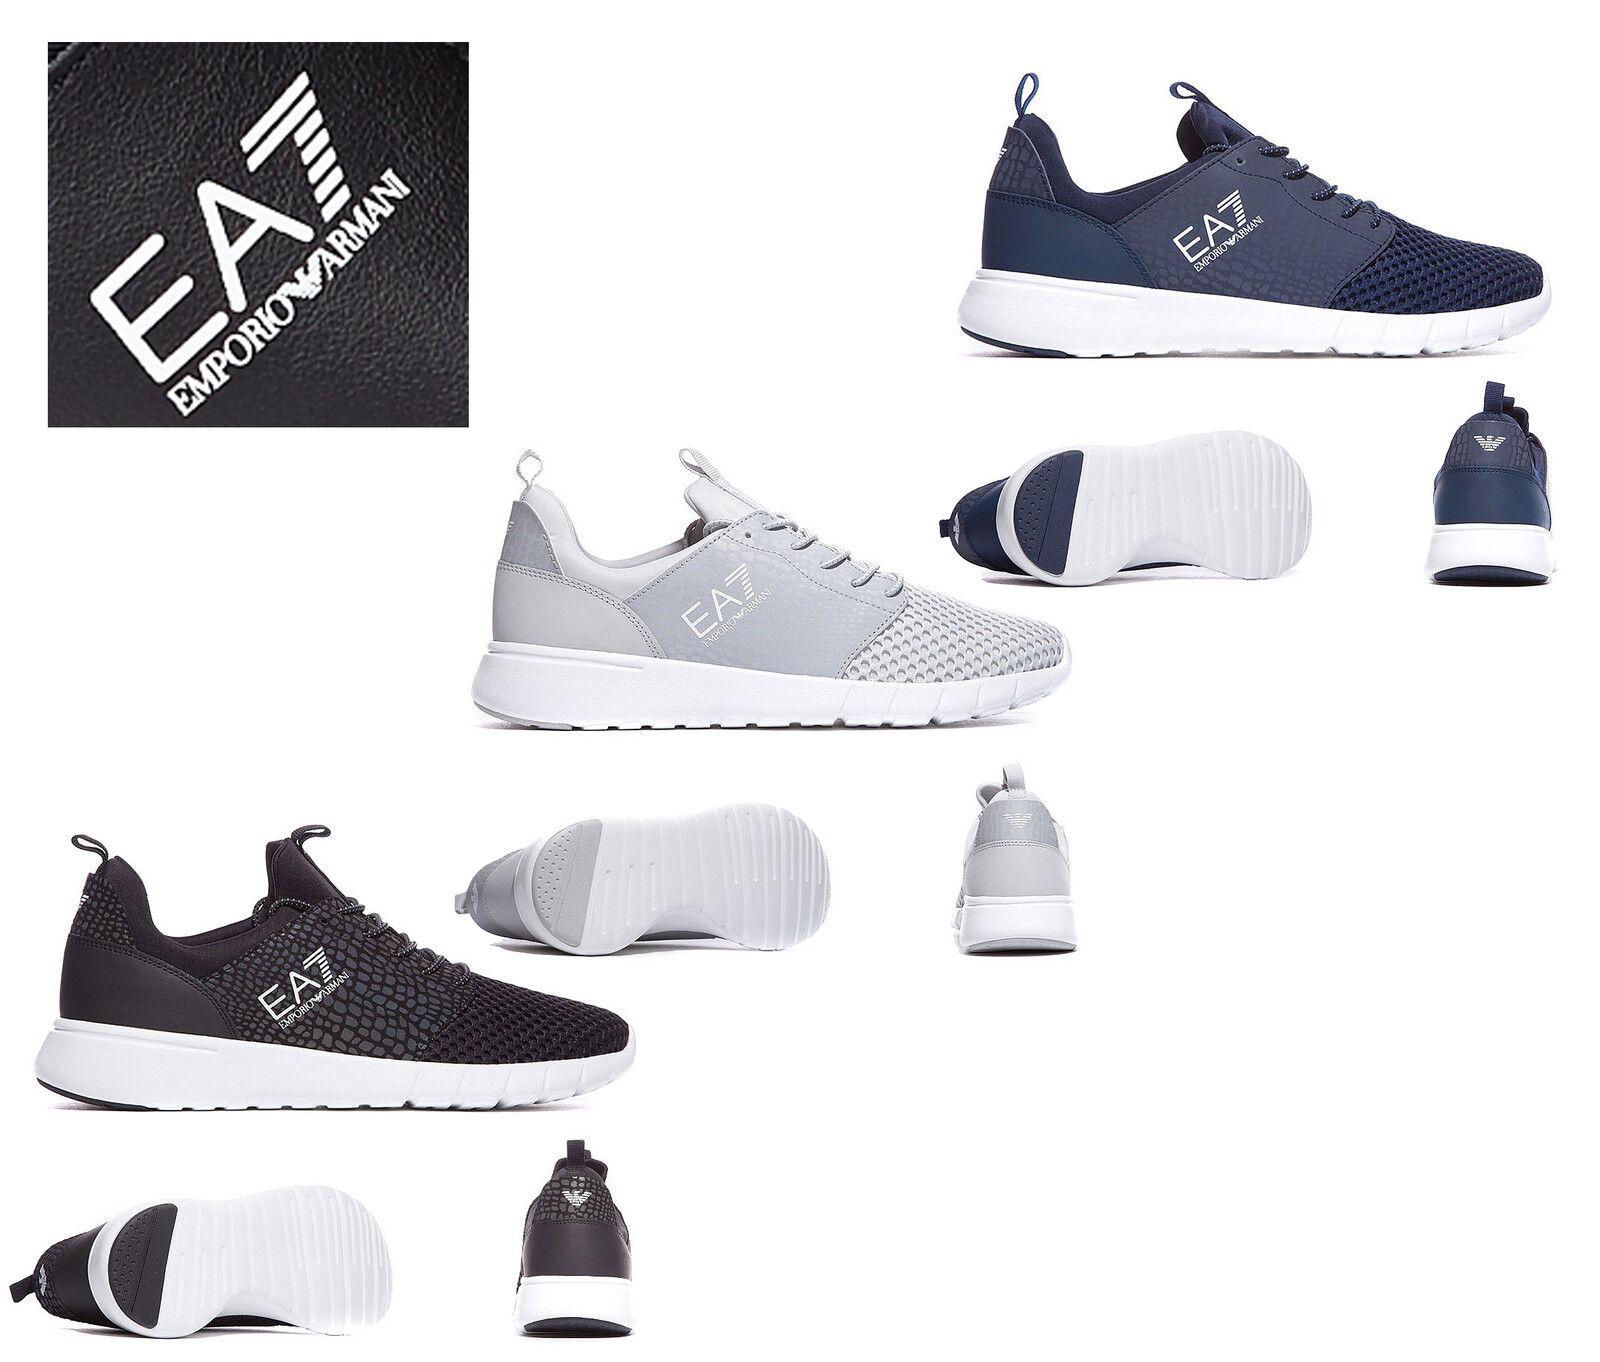 EA7 EMPORIO ARMANI Schuhe MENS BOYS NEU RACER MESH ULTRA B TRAINERS 100% ORIGINAL